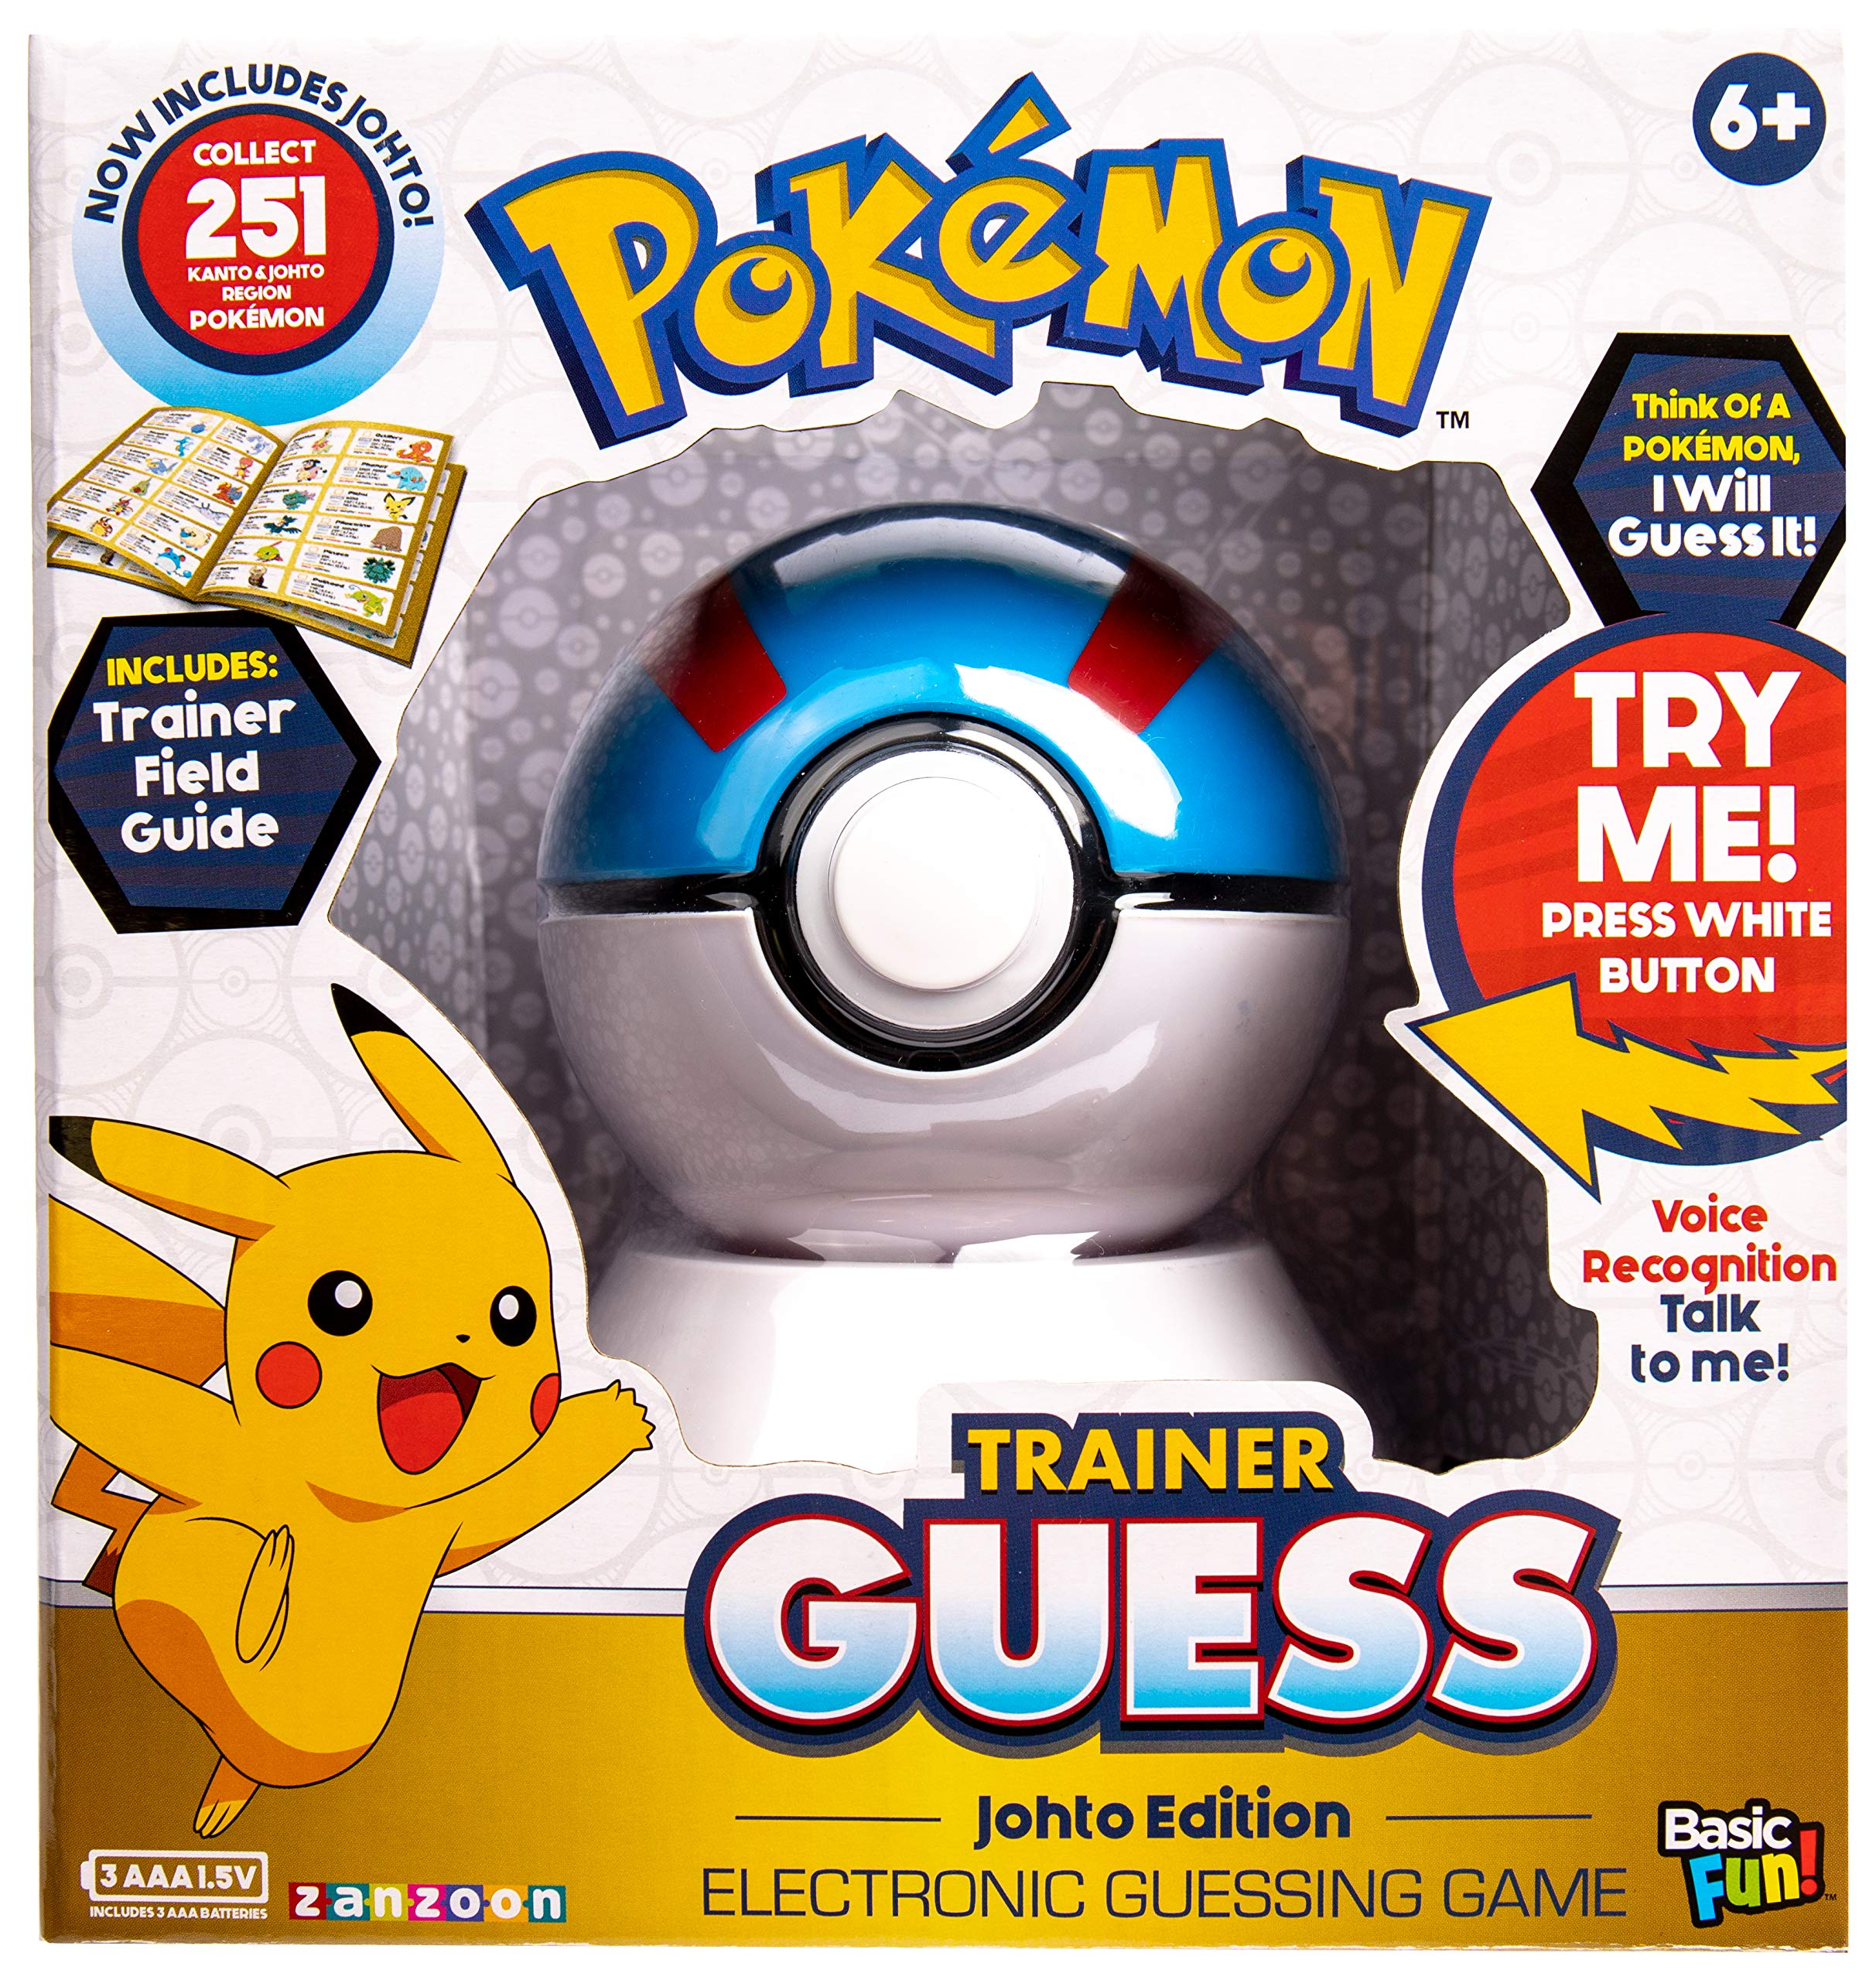 Basic Fun Pokémon Trainer Guess: Johto Edition - Electronic Game